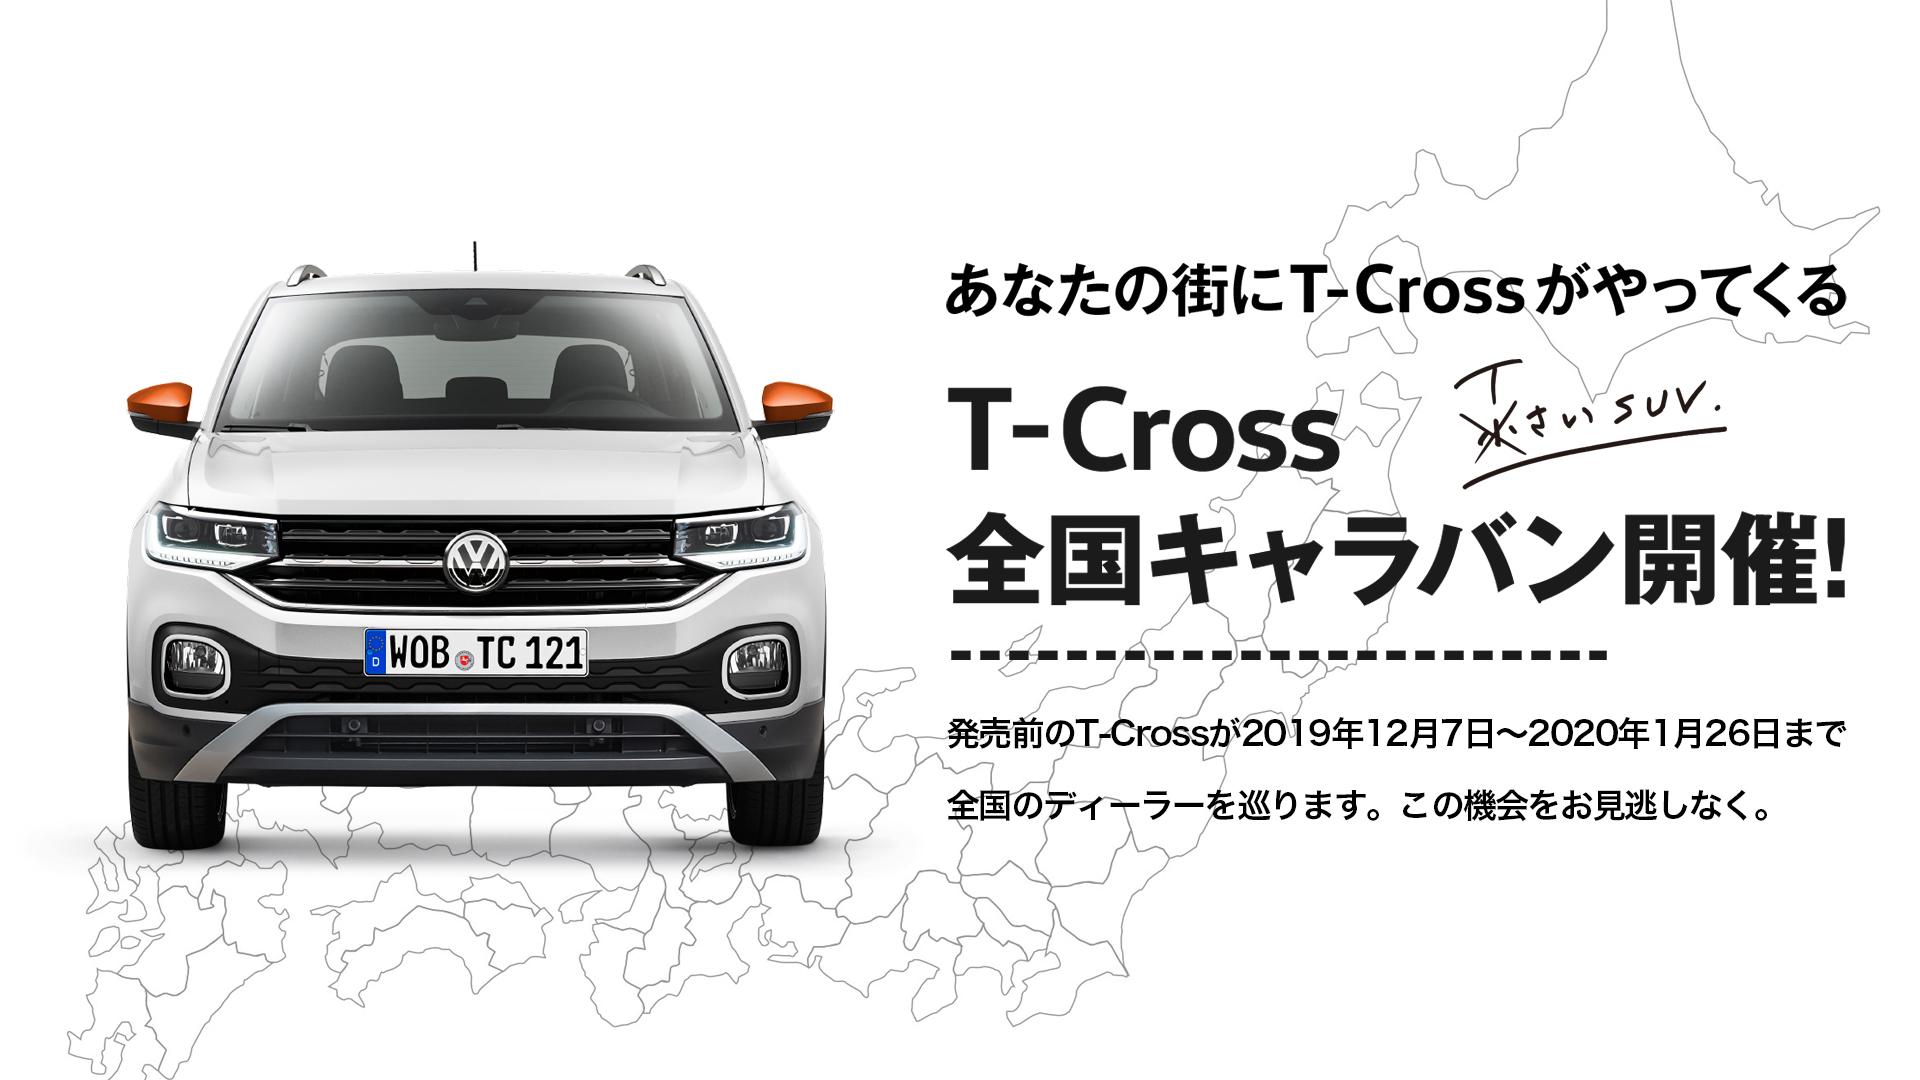 T-Cross 全国キャラバン